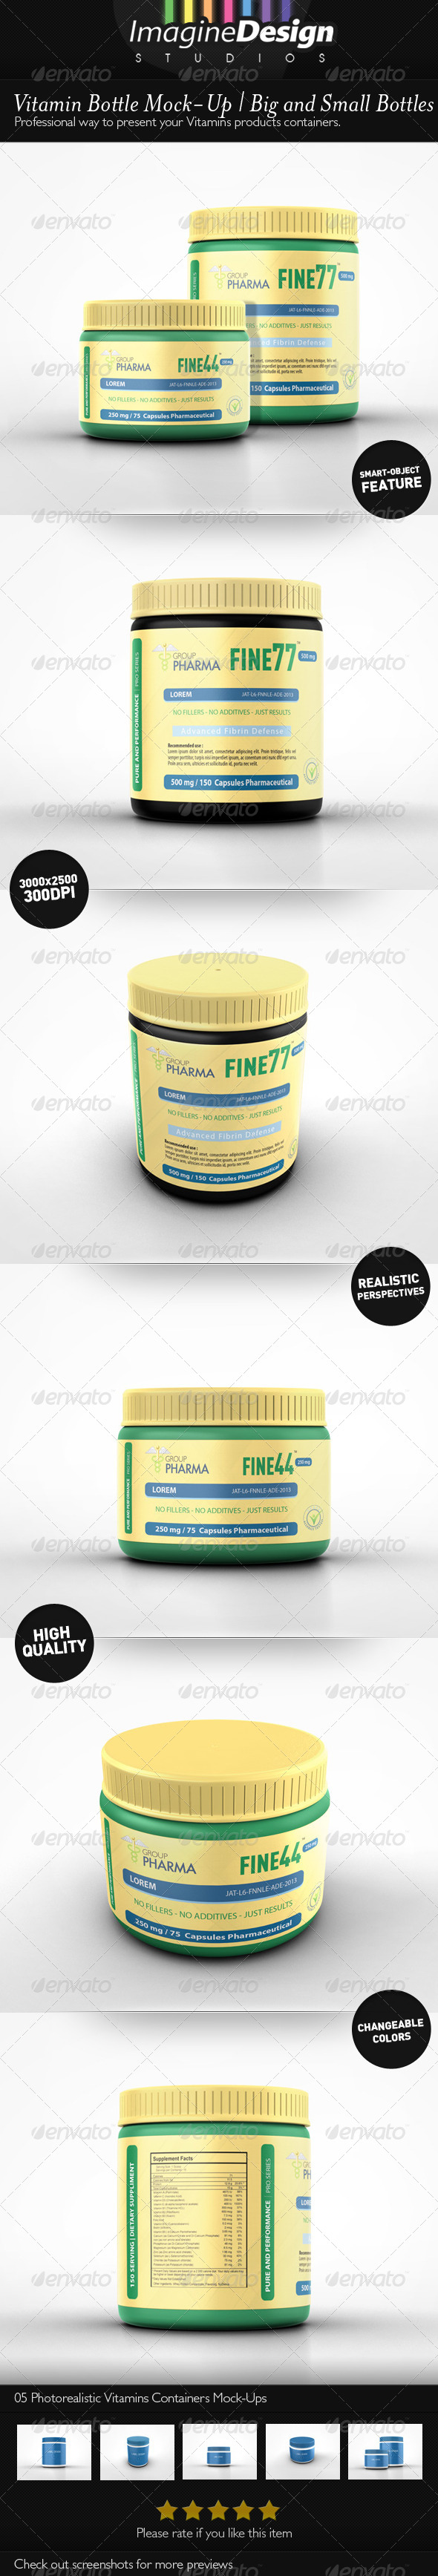 GraphicRiver Vitamin Bottle Mockup 6952031